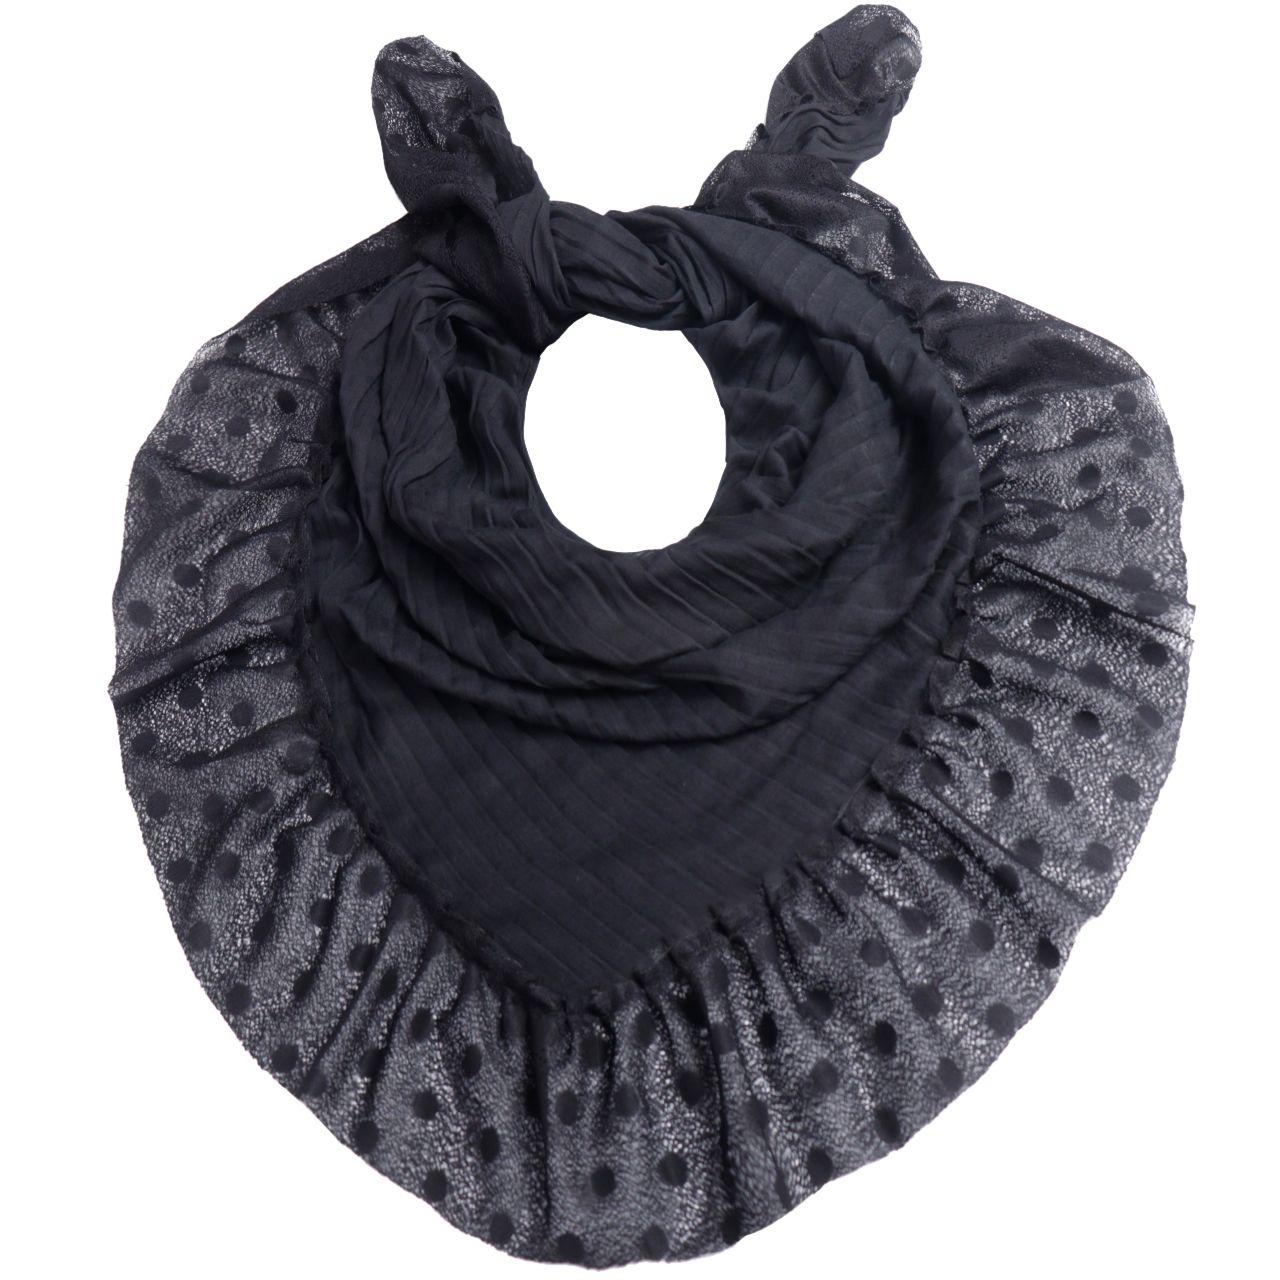 روسری زنانه کد Tp_44364-38